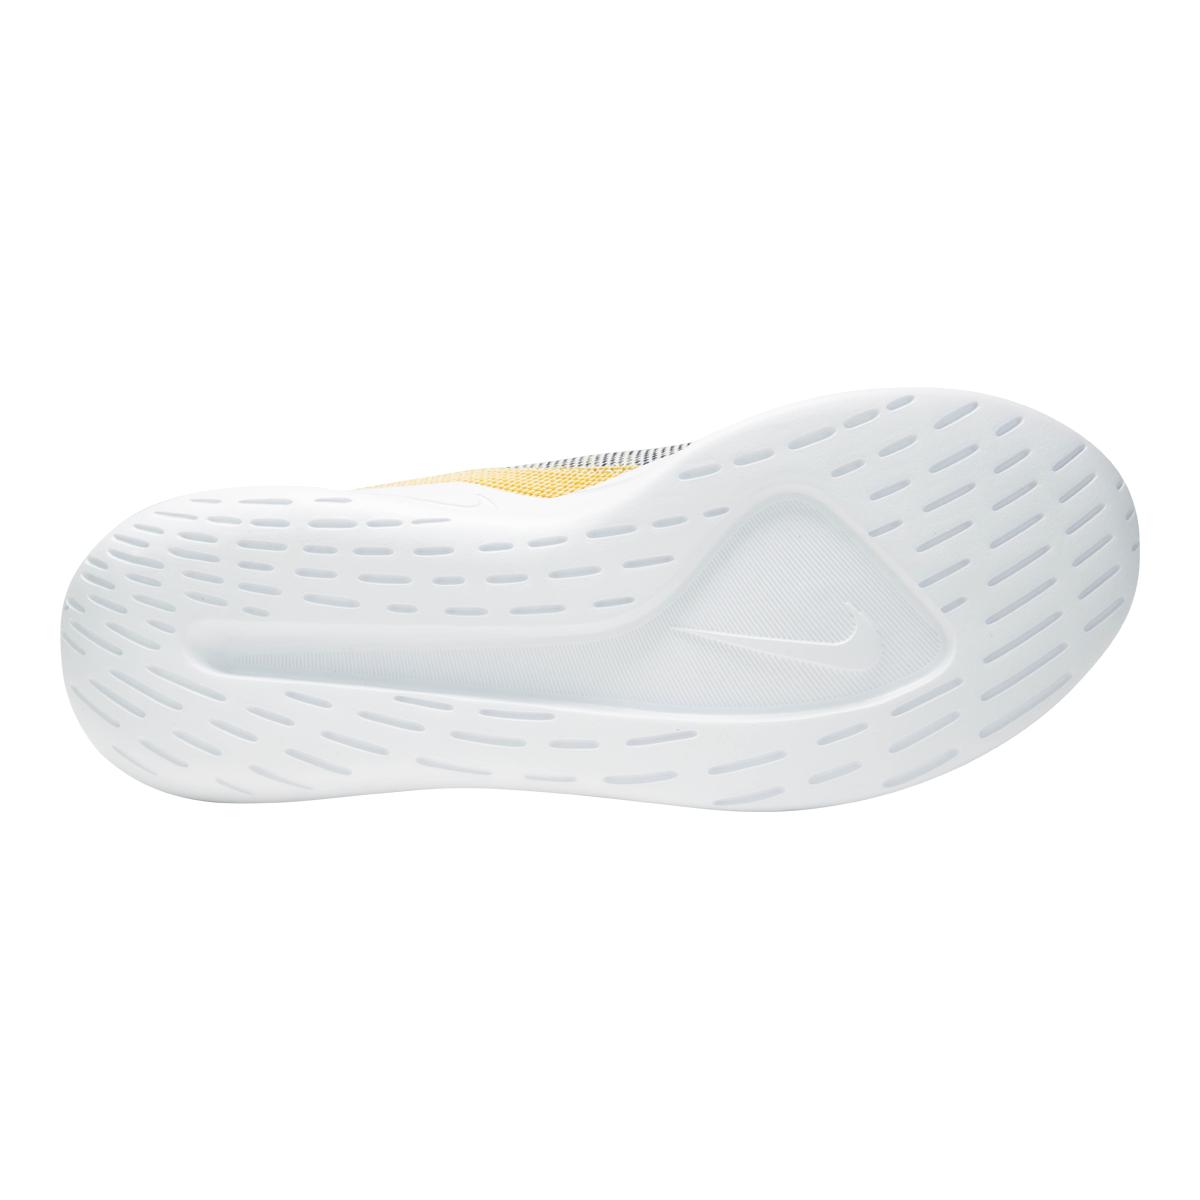 Nike-Men-039-s-Viale-Premium-Running-Shoes thumbnail 16